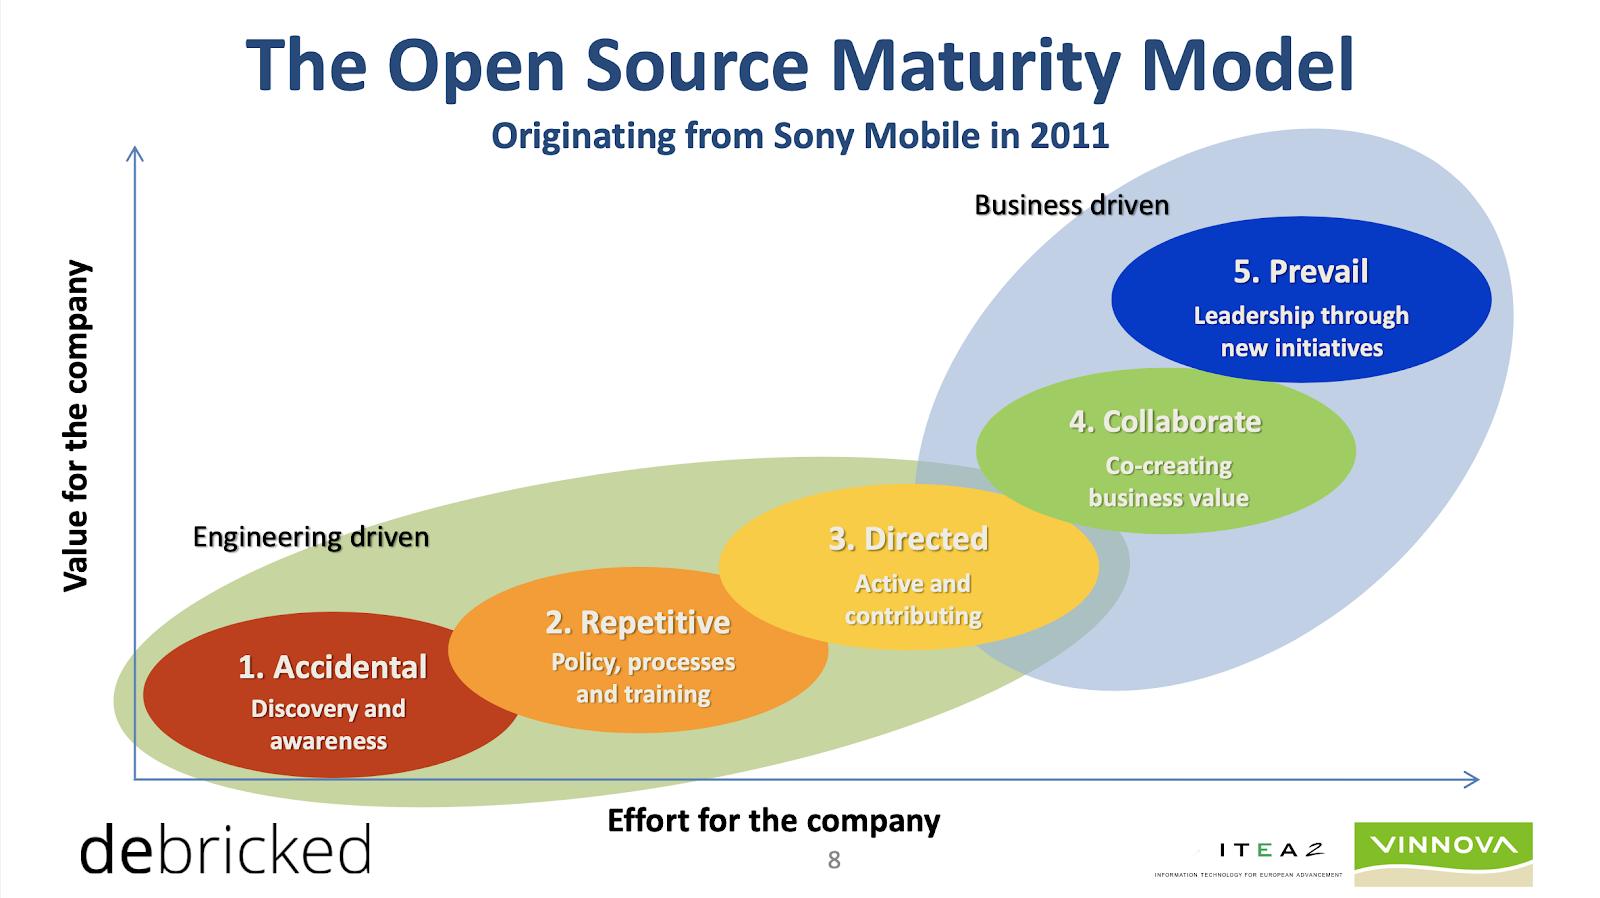 The-open-source-maturity-model-debricked